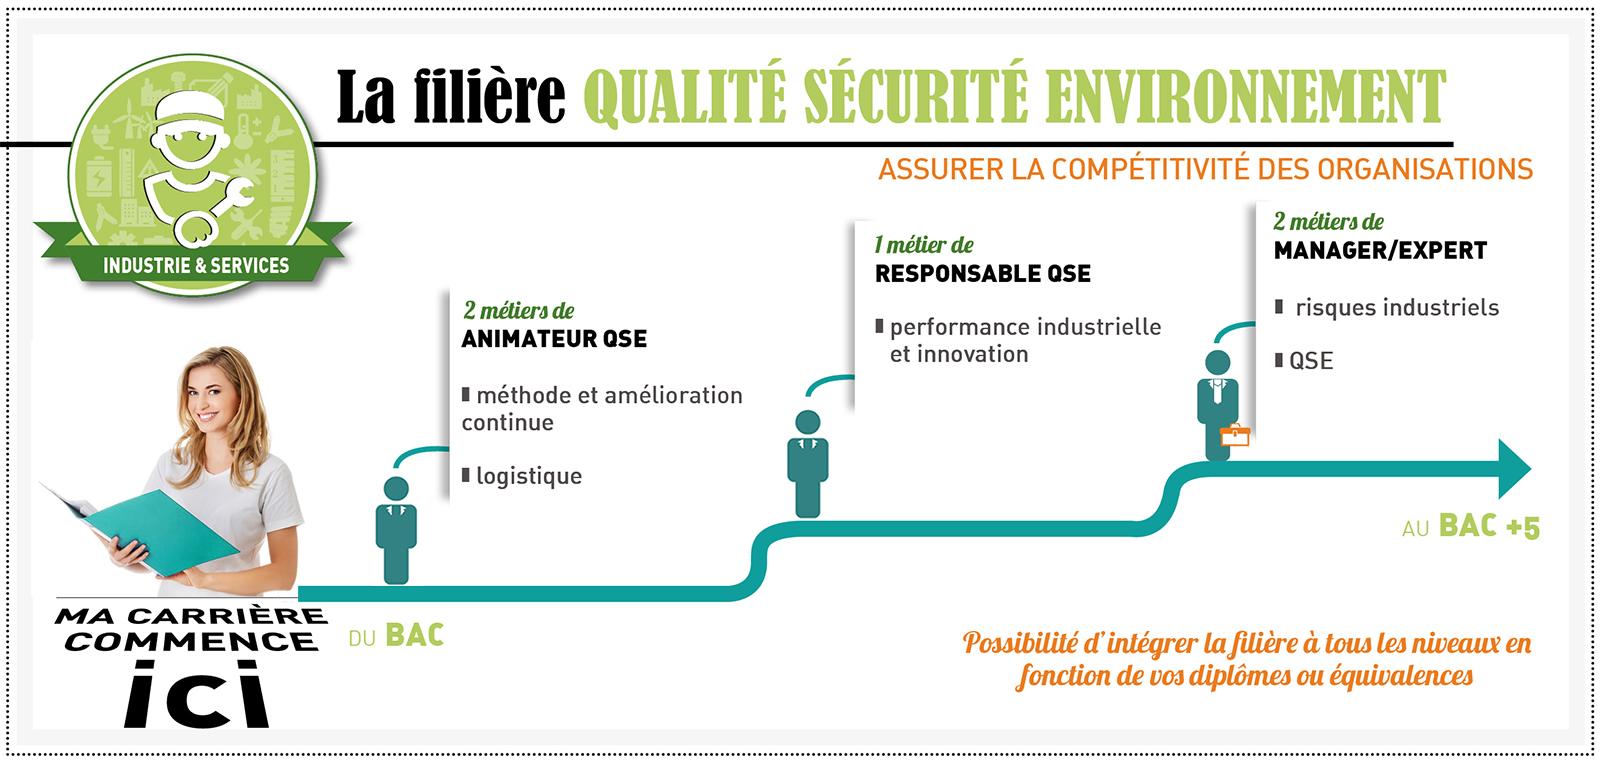 formation professionnelle qualite securite environnement